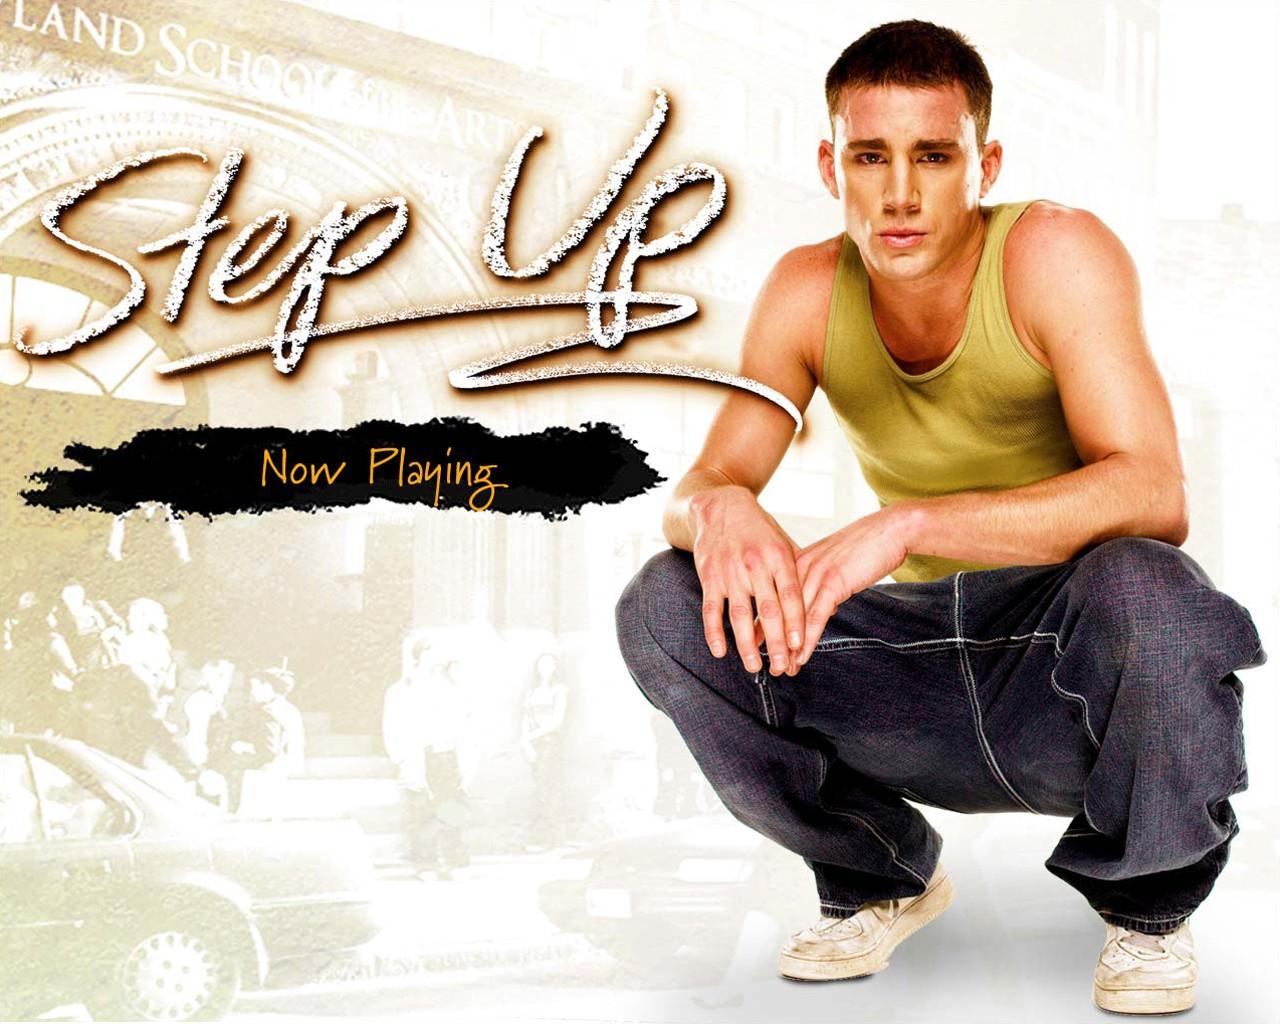 Wallpaper del film Step Up, con Channing Tatum